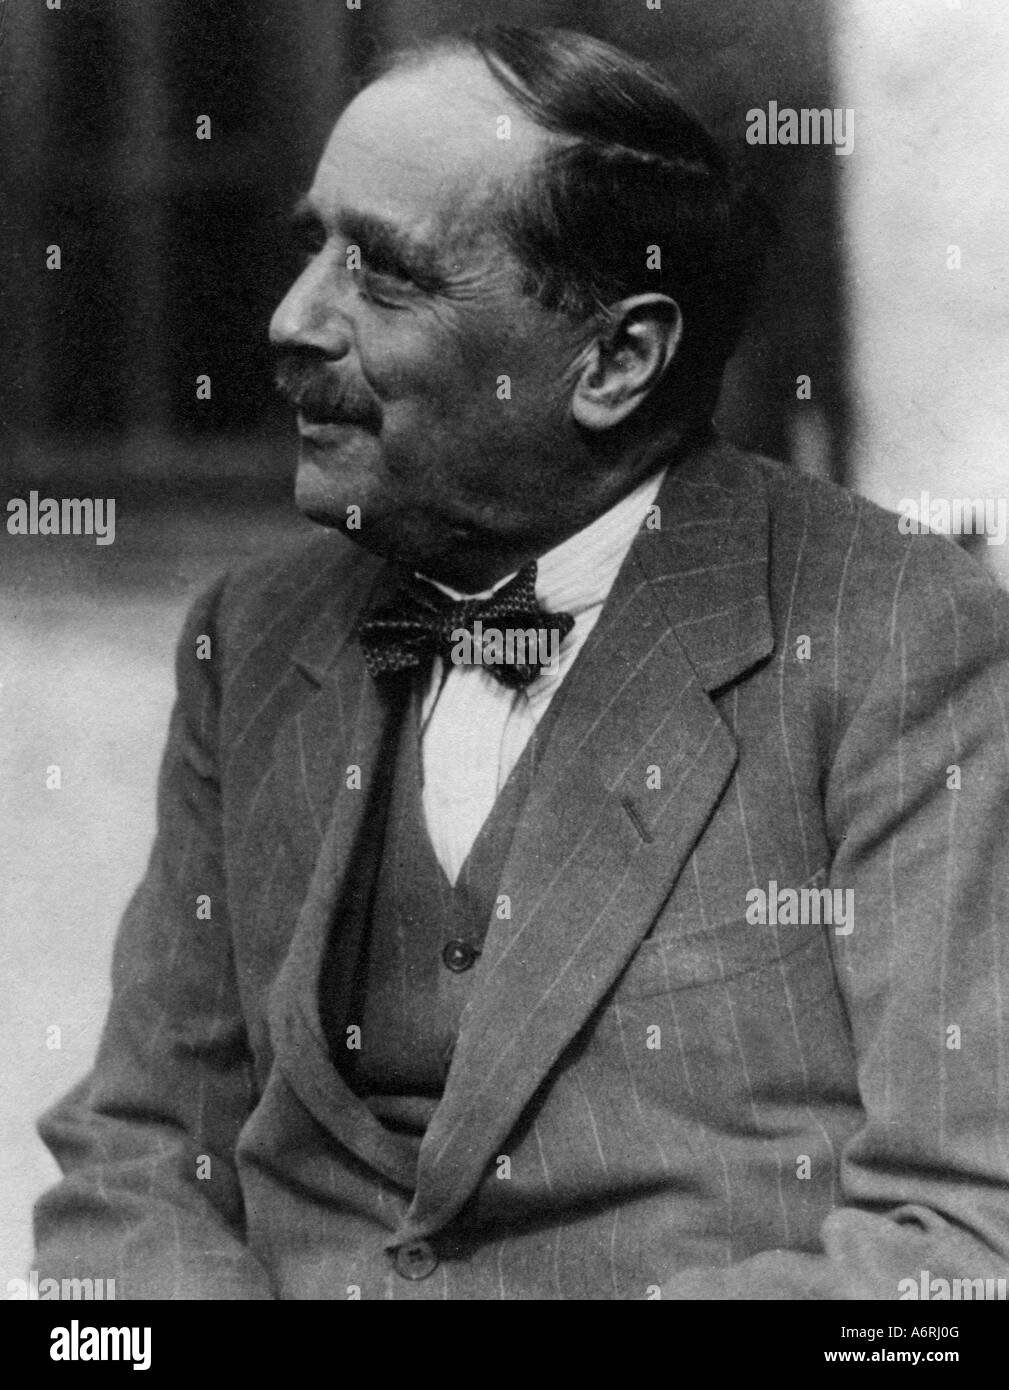 Wells, Herbert George, 21.9.1866 - 13.8.1946, British author / writer, portrait, 20th century, bow tie, pin striped Stock Photo